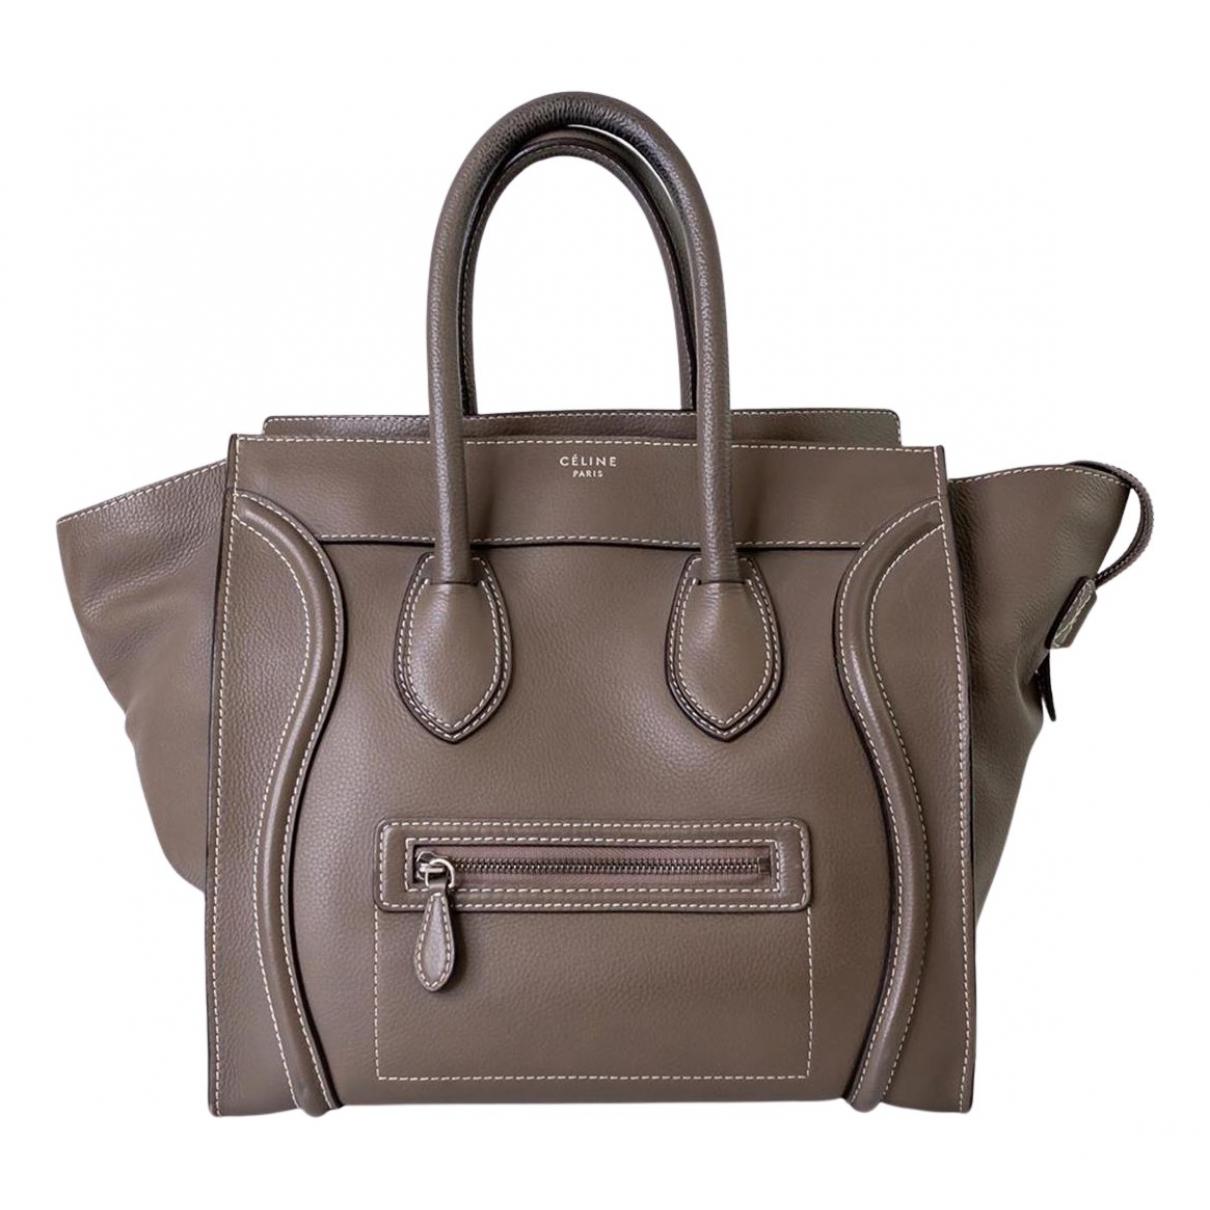 Celine Luggage Grey Leather handbag for Women N